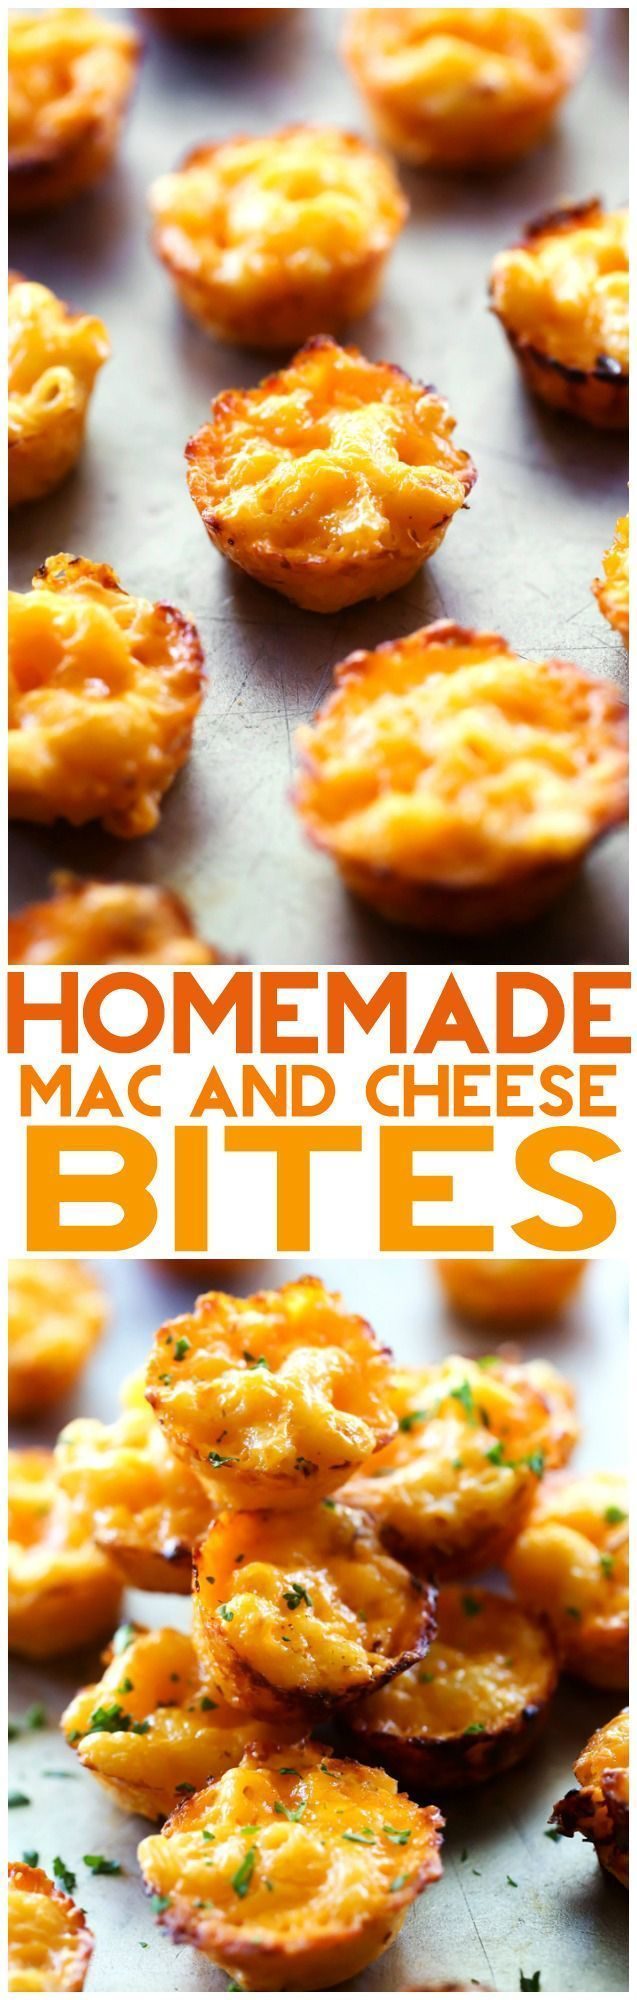 Macaroni met kaas : als hapje